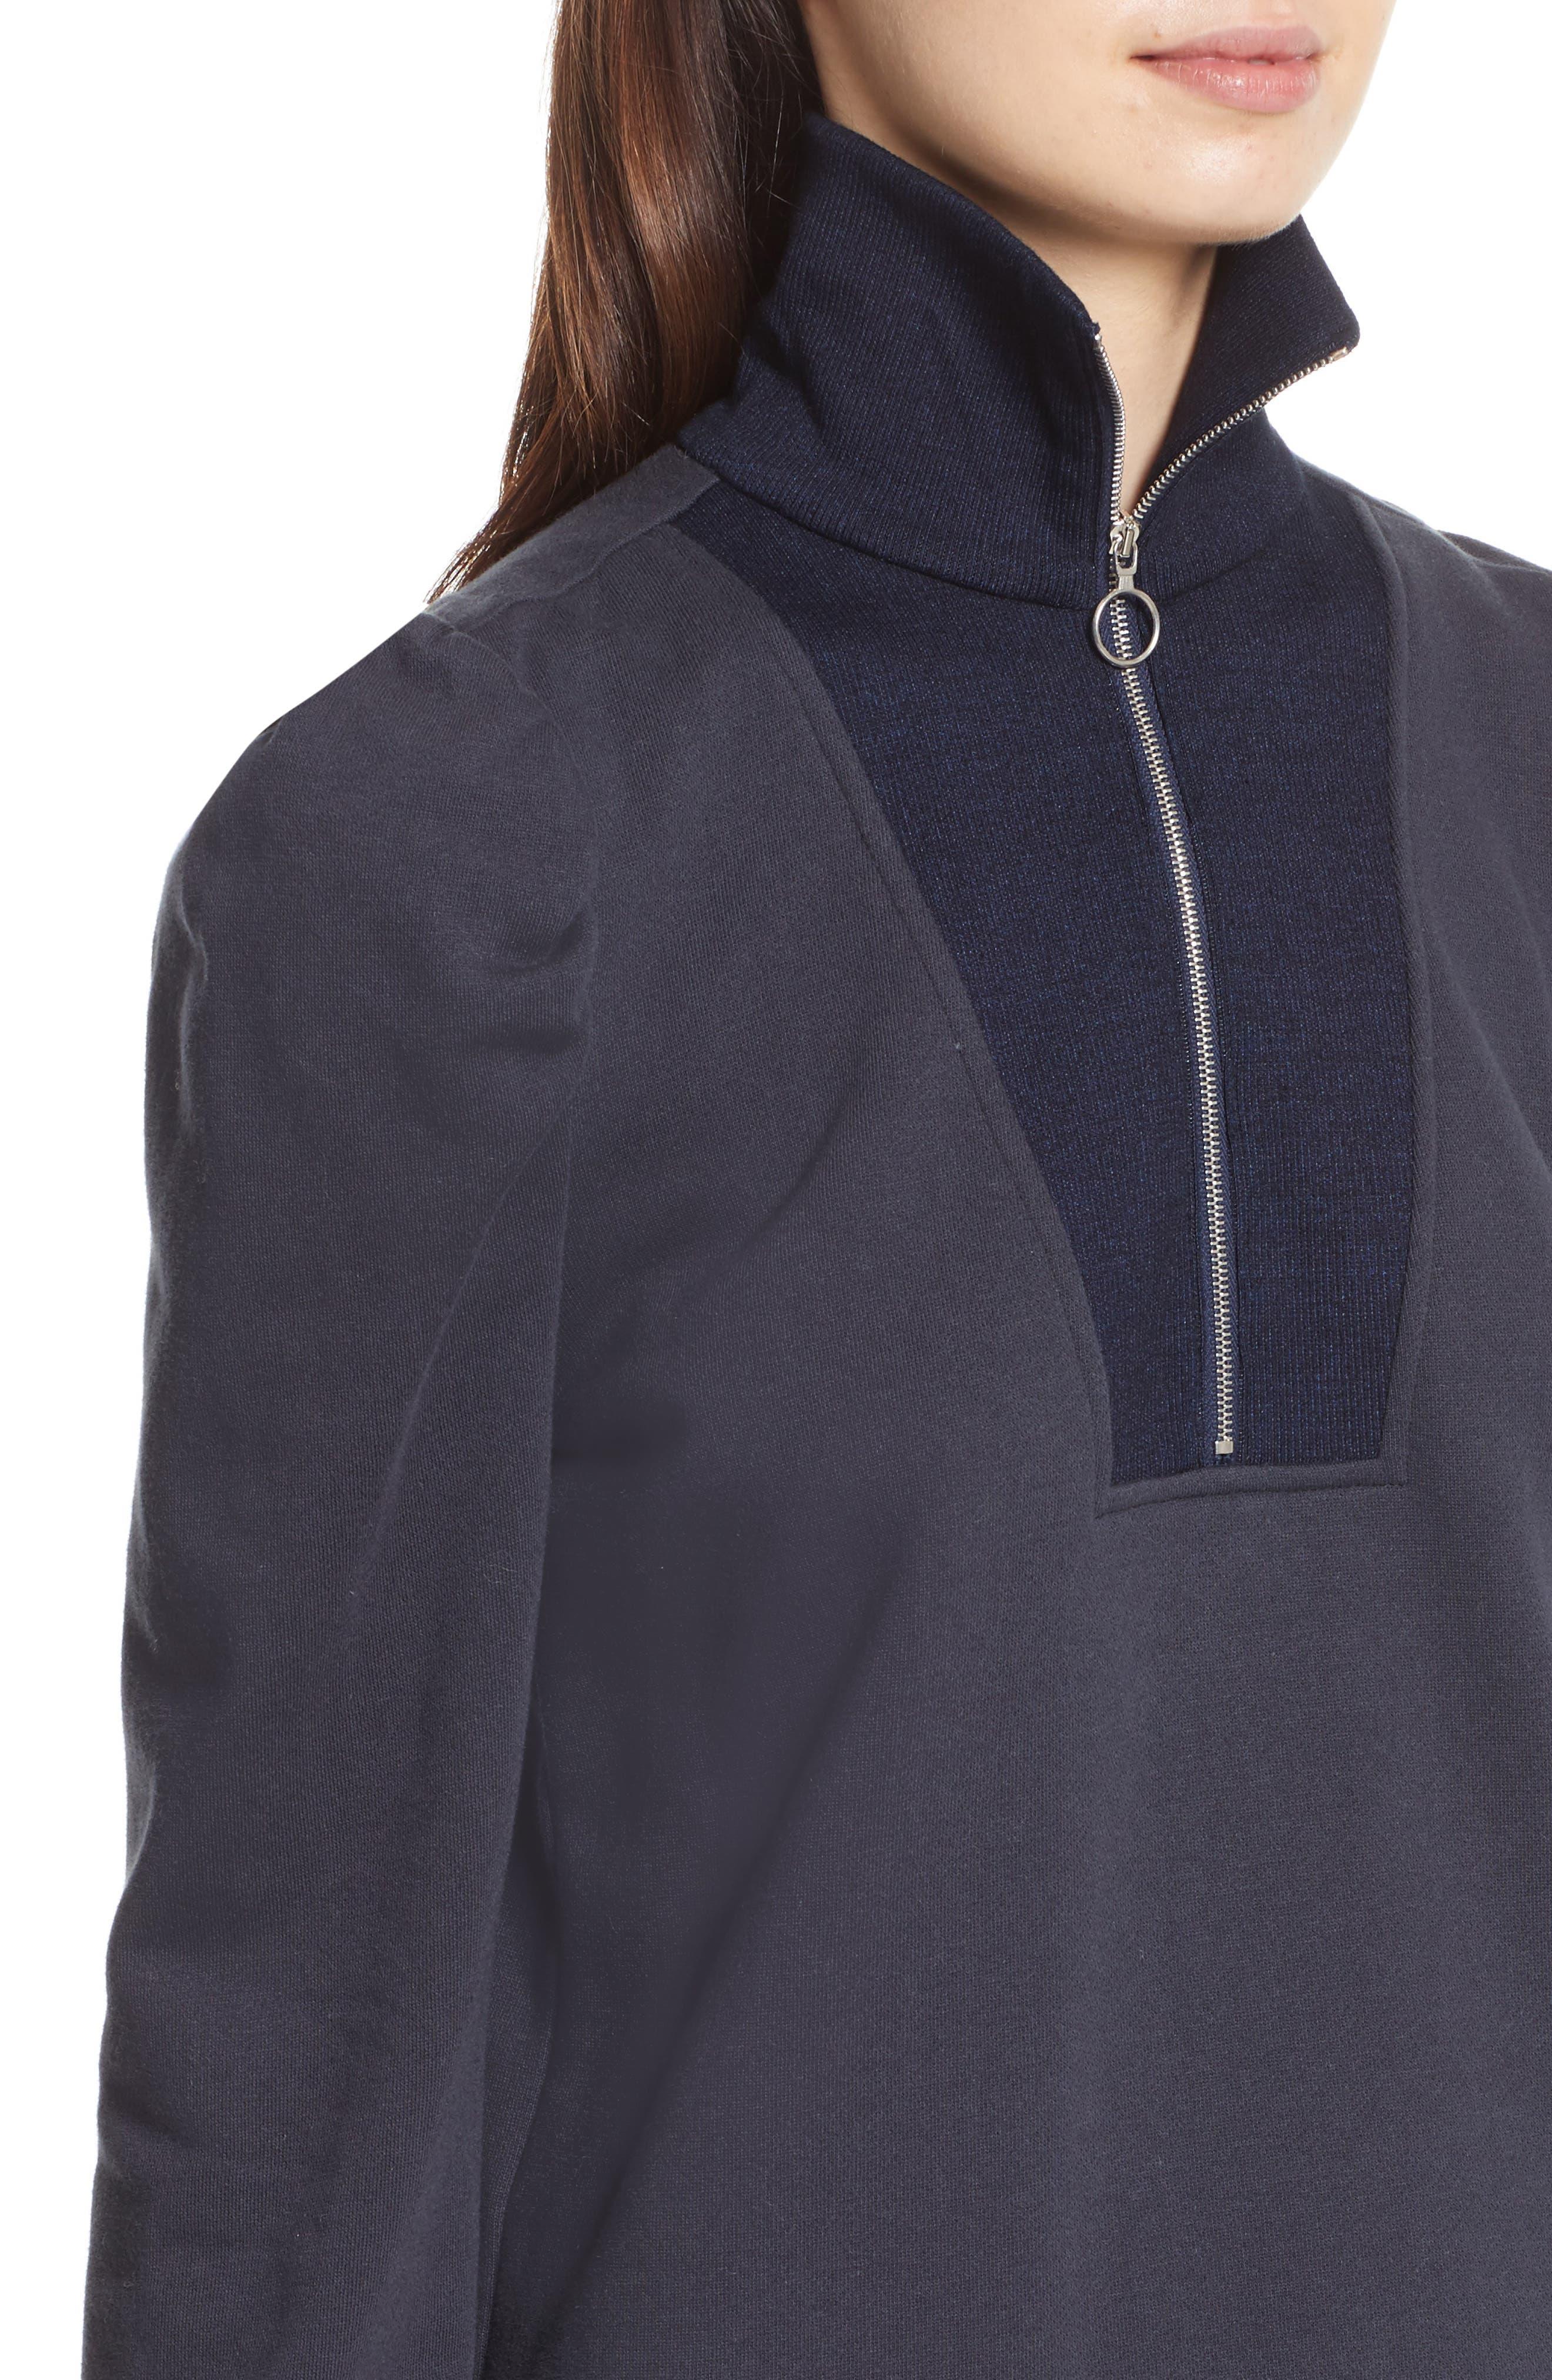 Alternate Image 4  - Rebecca Taylor Turtleneck Fleece Zip Pullover